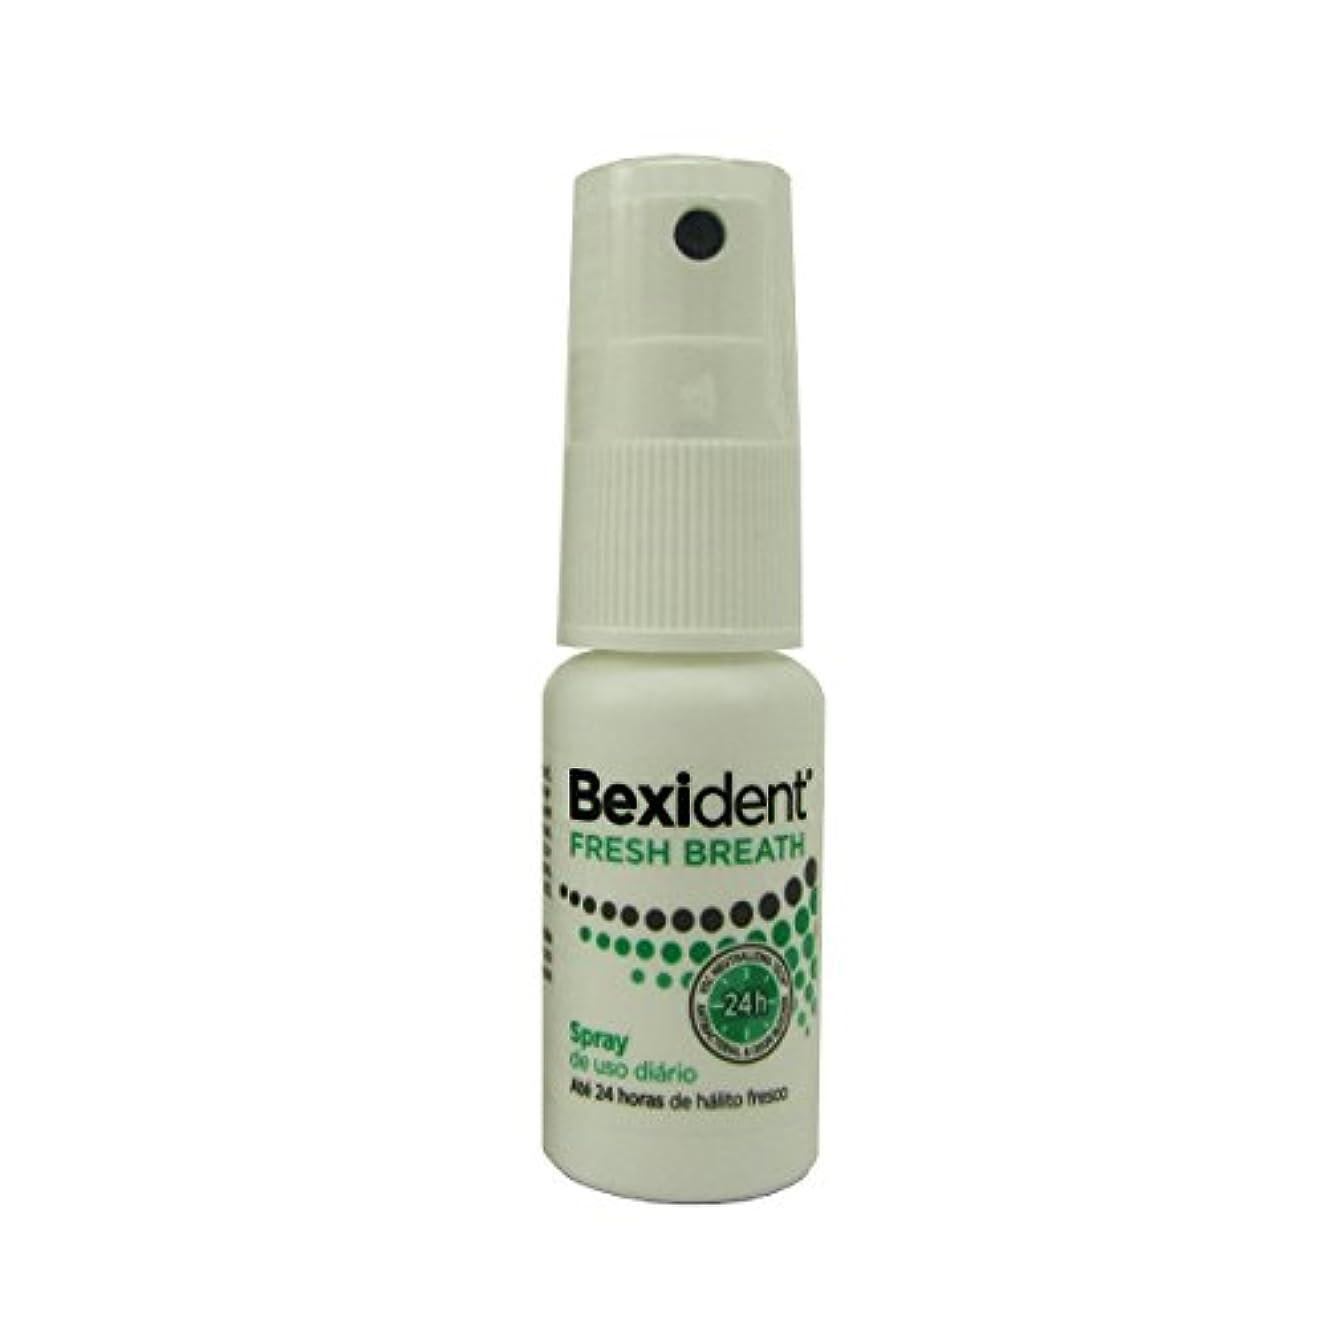 混合非常に船上Bexident Fresh Breath Spray 15ml [並行輸入品]